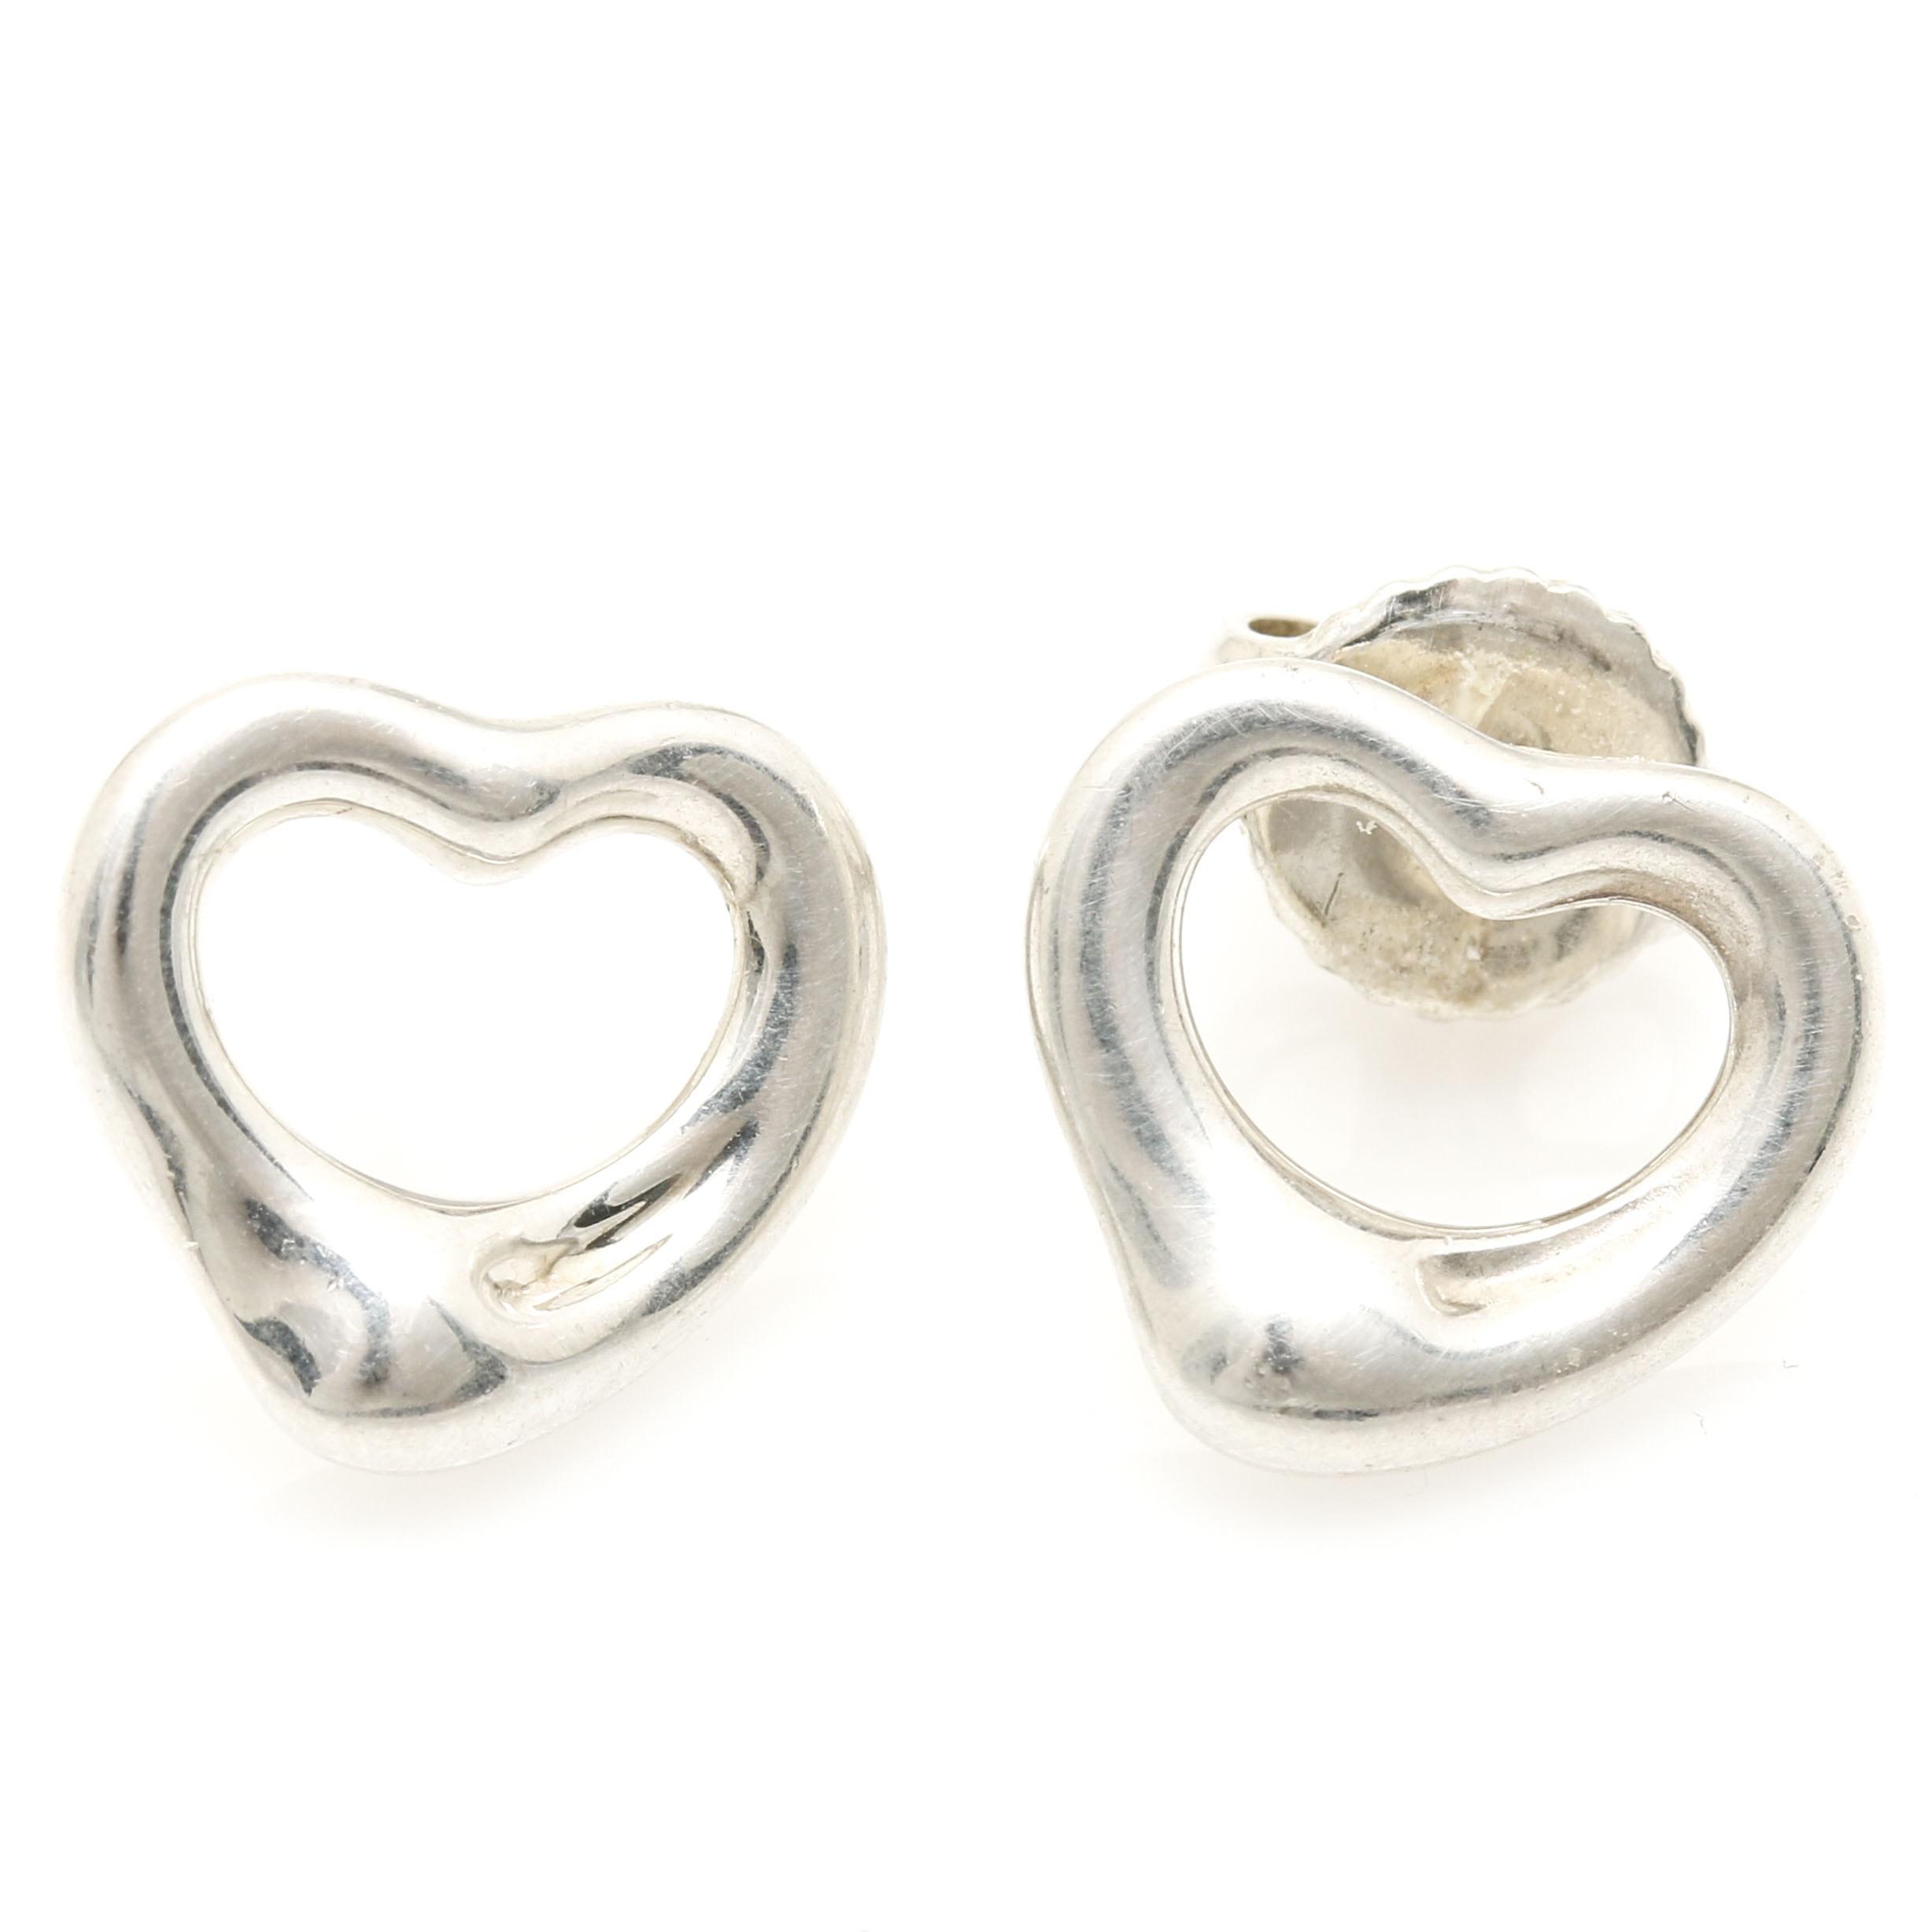 Tiffany & Co. Elsa Peretti Heart Earrings